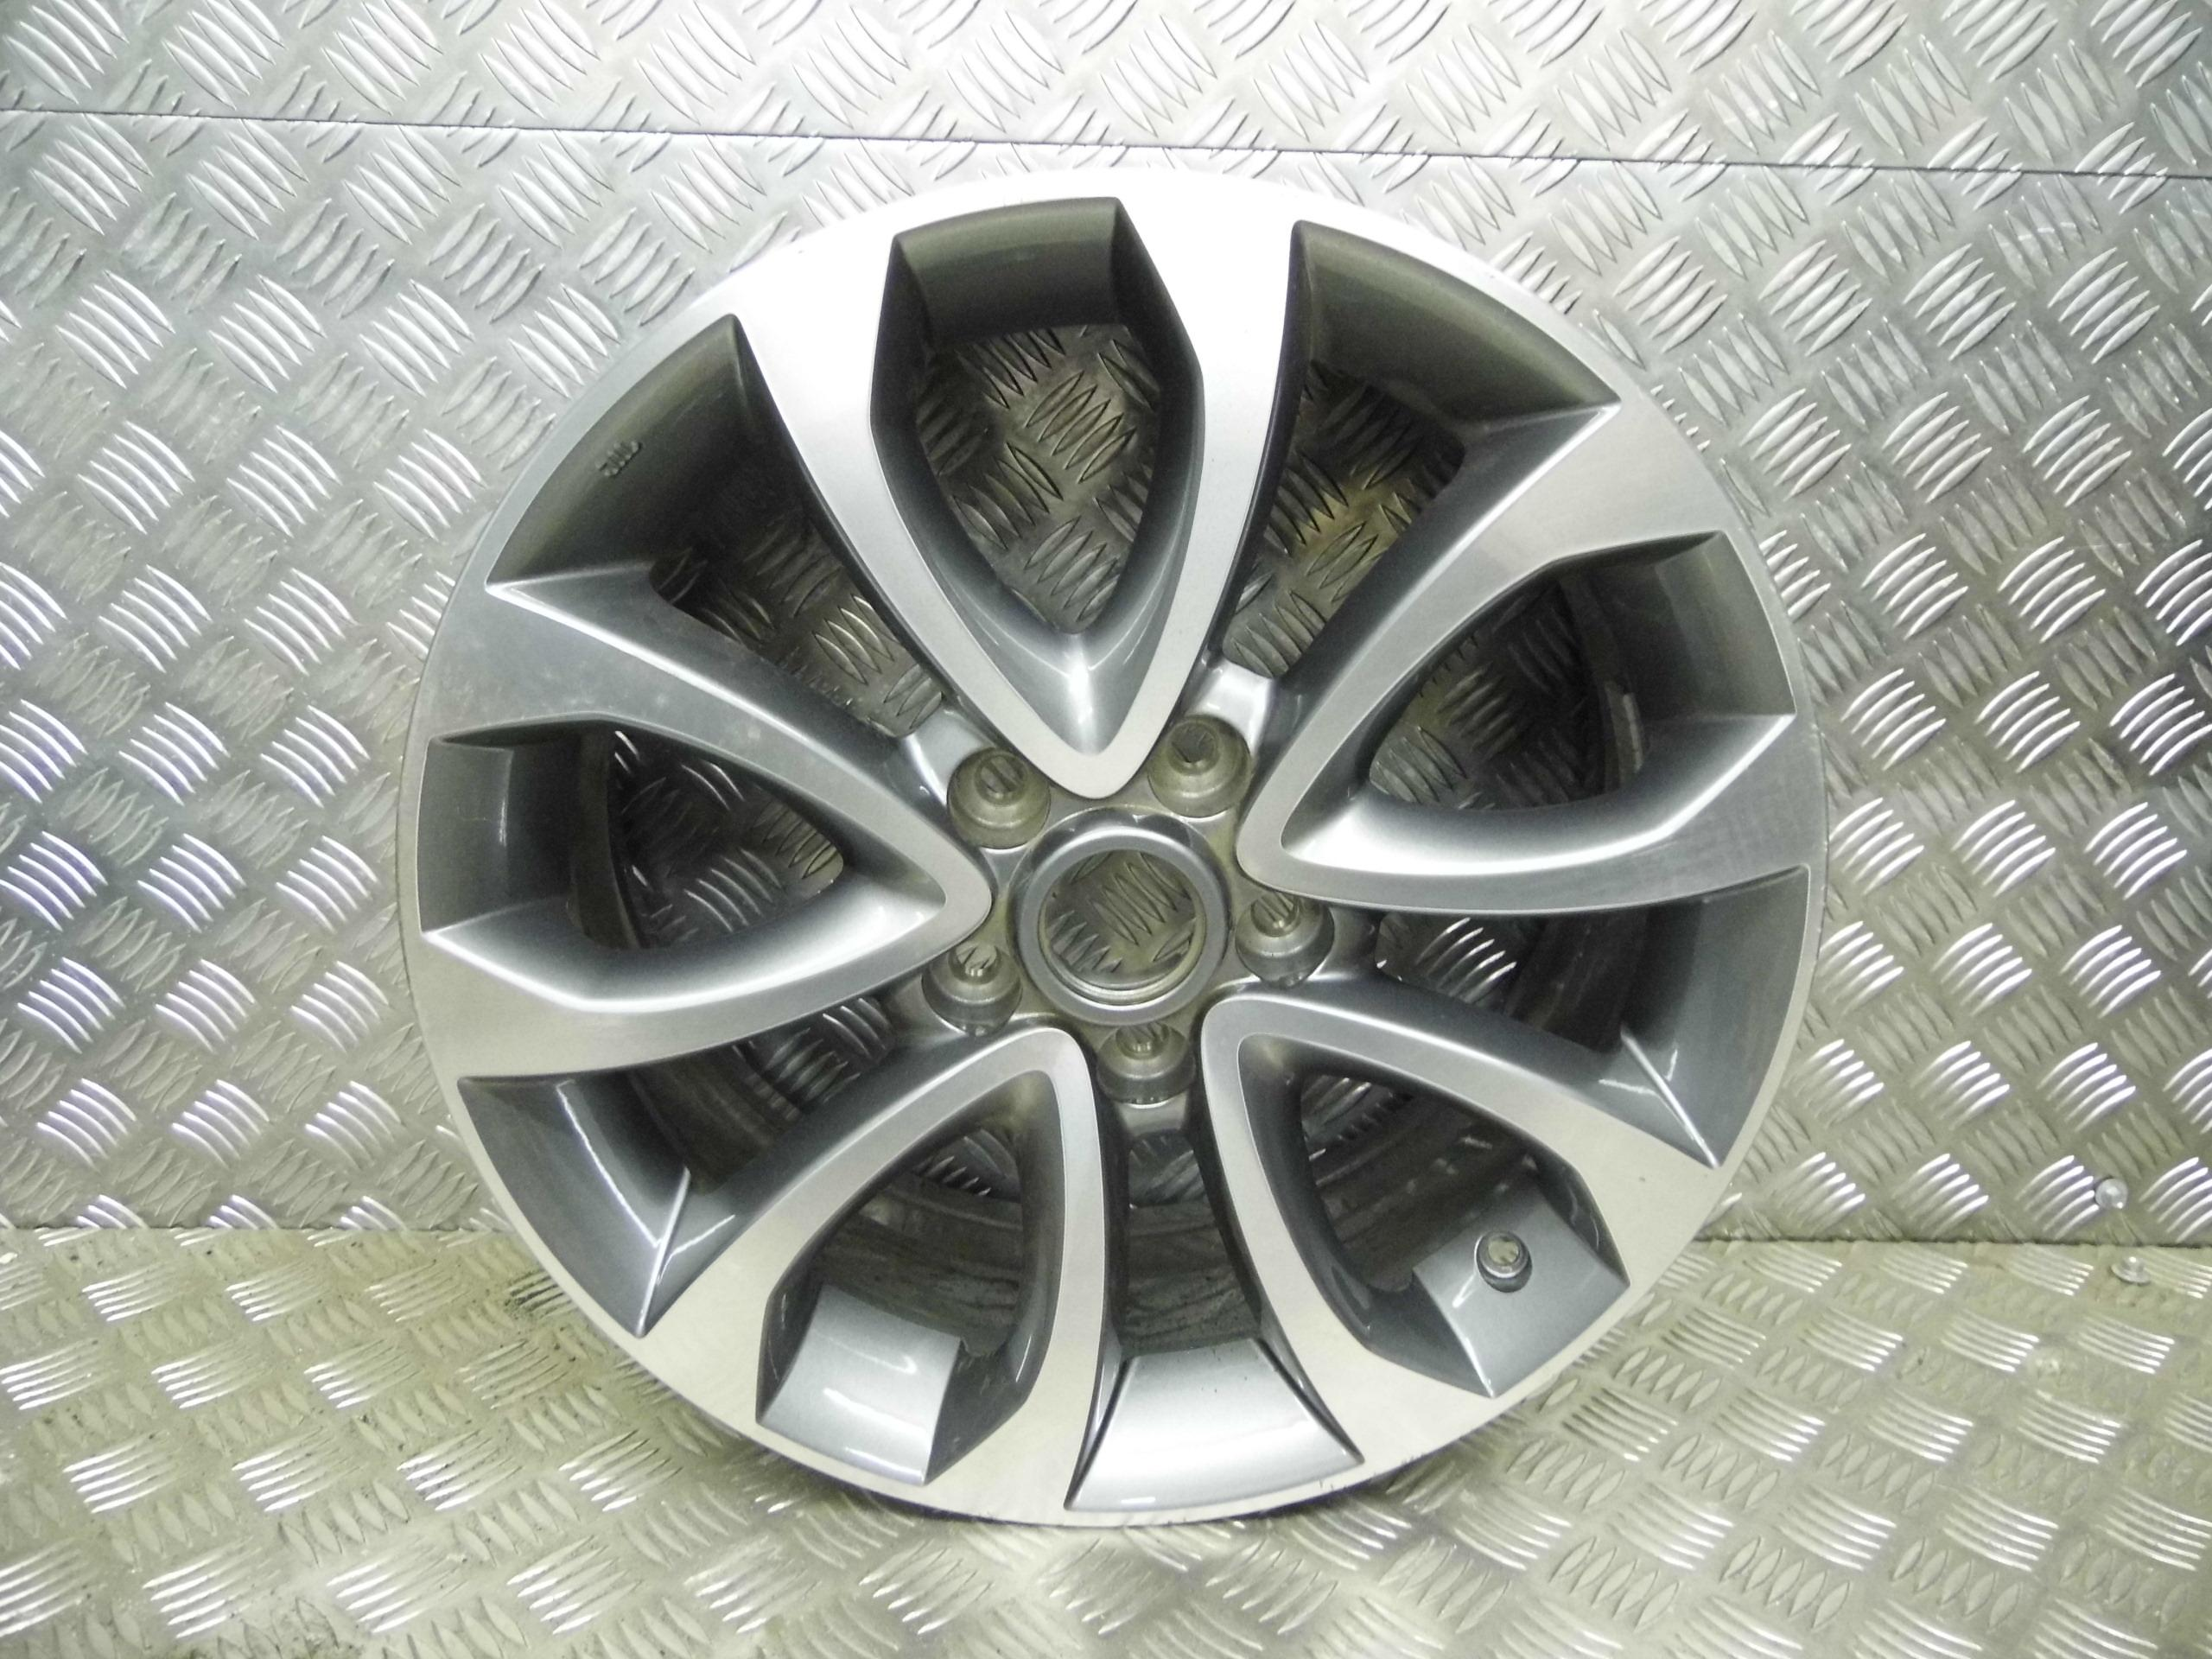 used 2011 nissan juke 7j x 17 inch 5 stud alloy wheel  no center cap